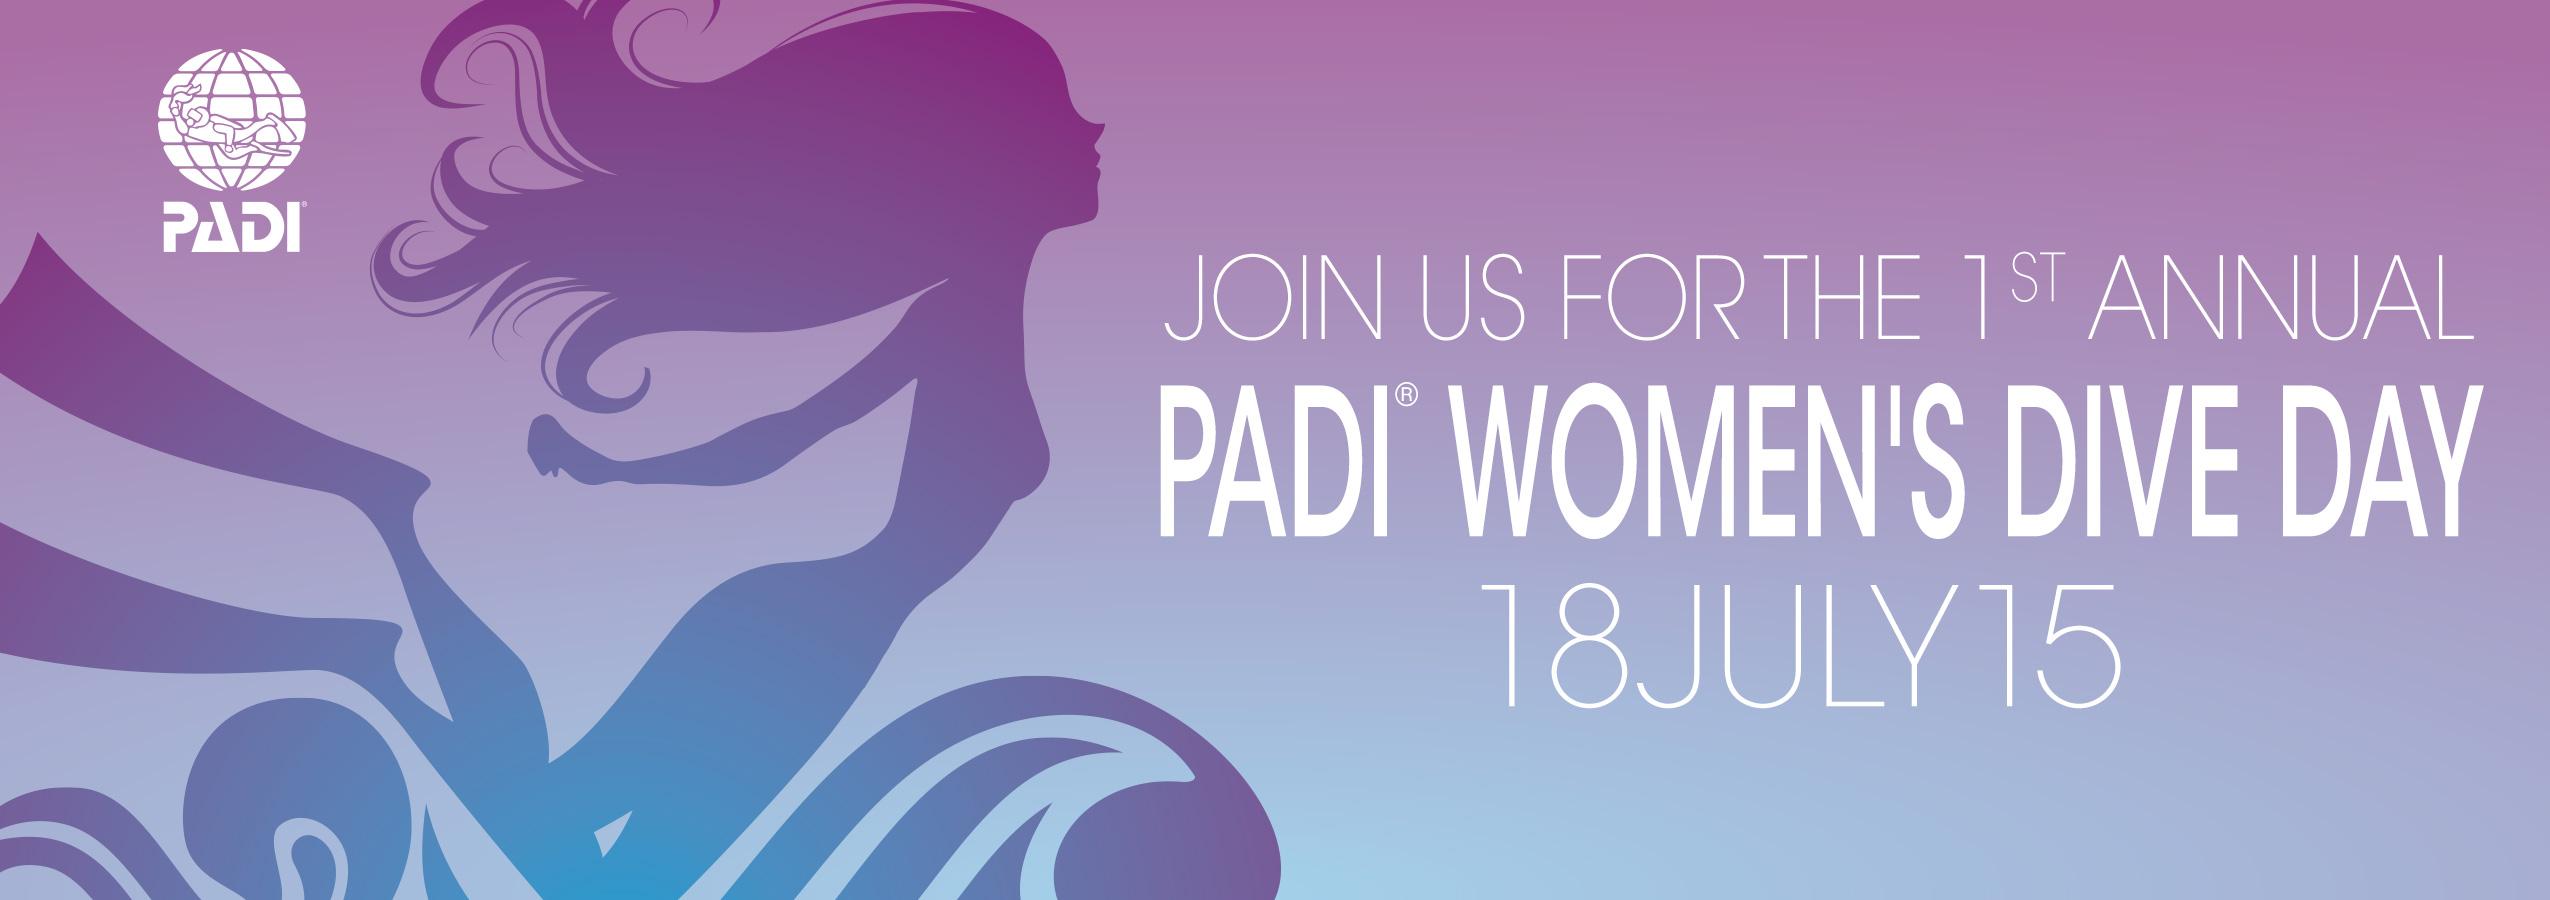 09/09 PADI Women's Dive Day